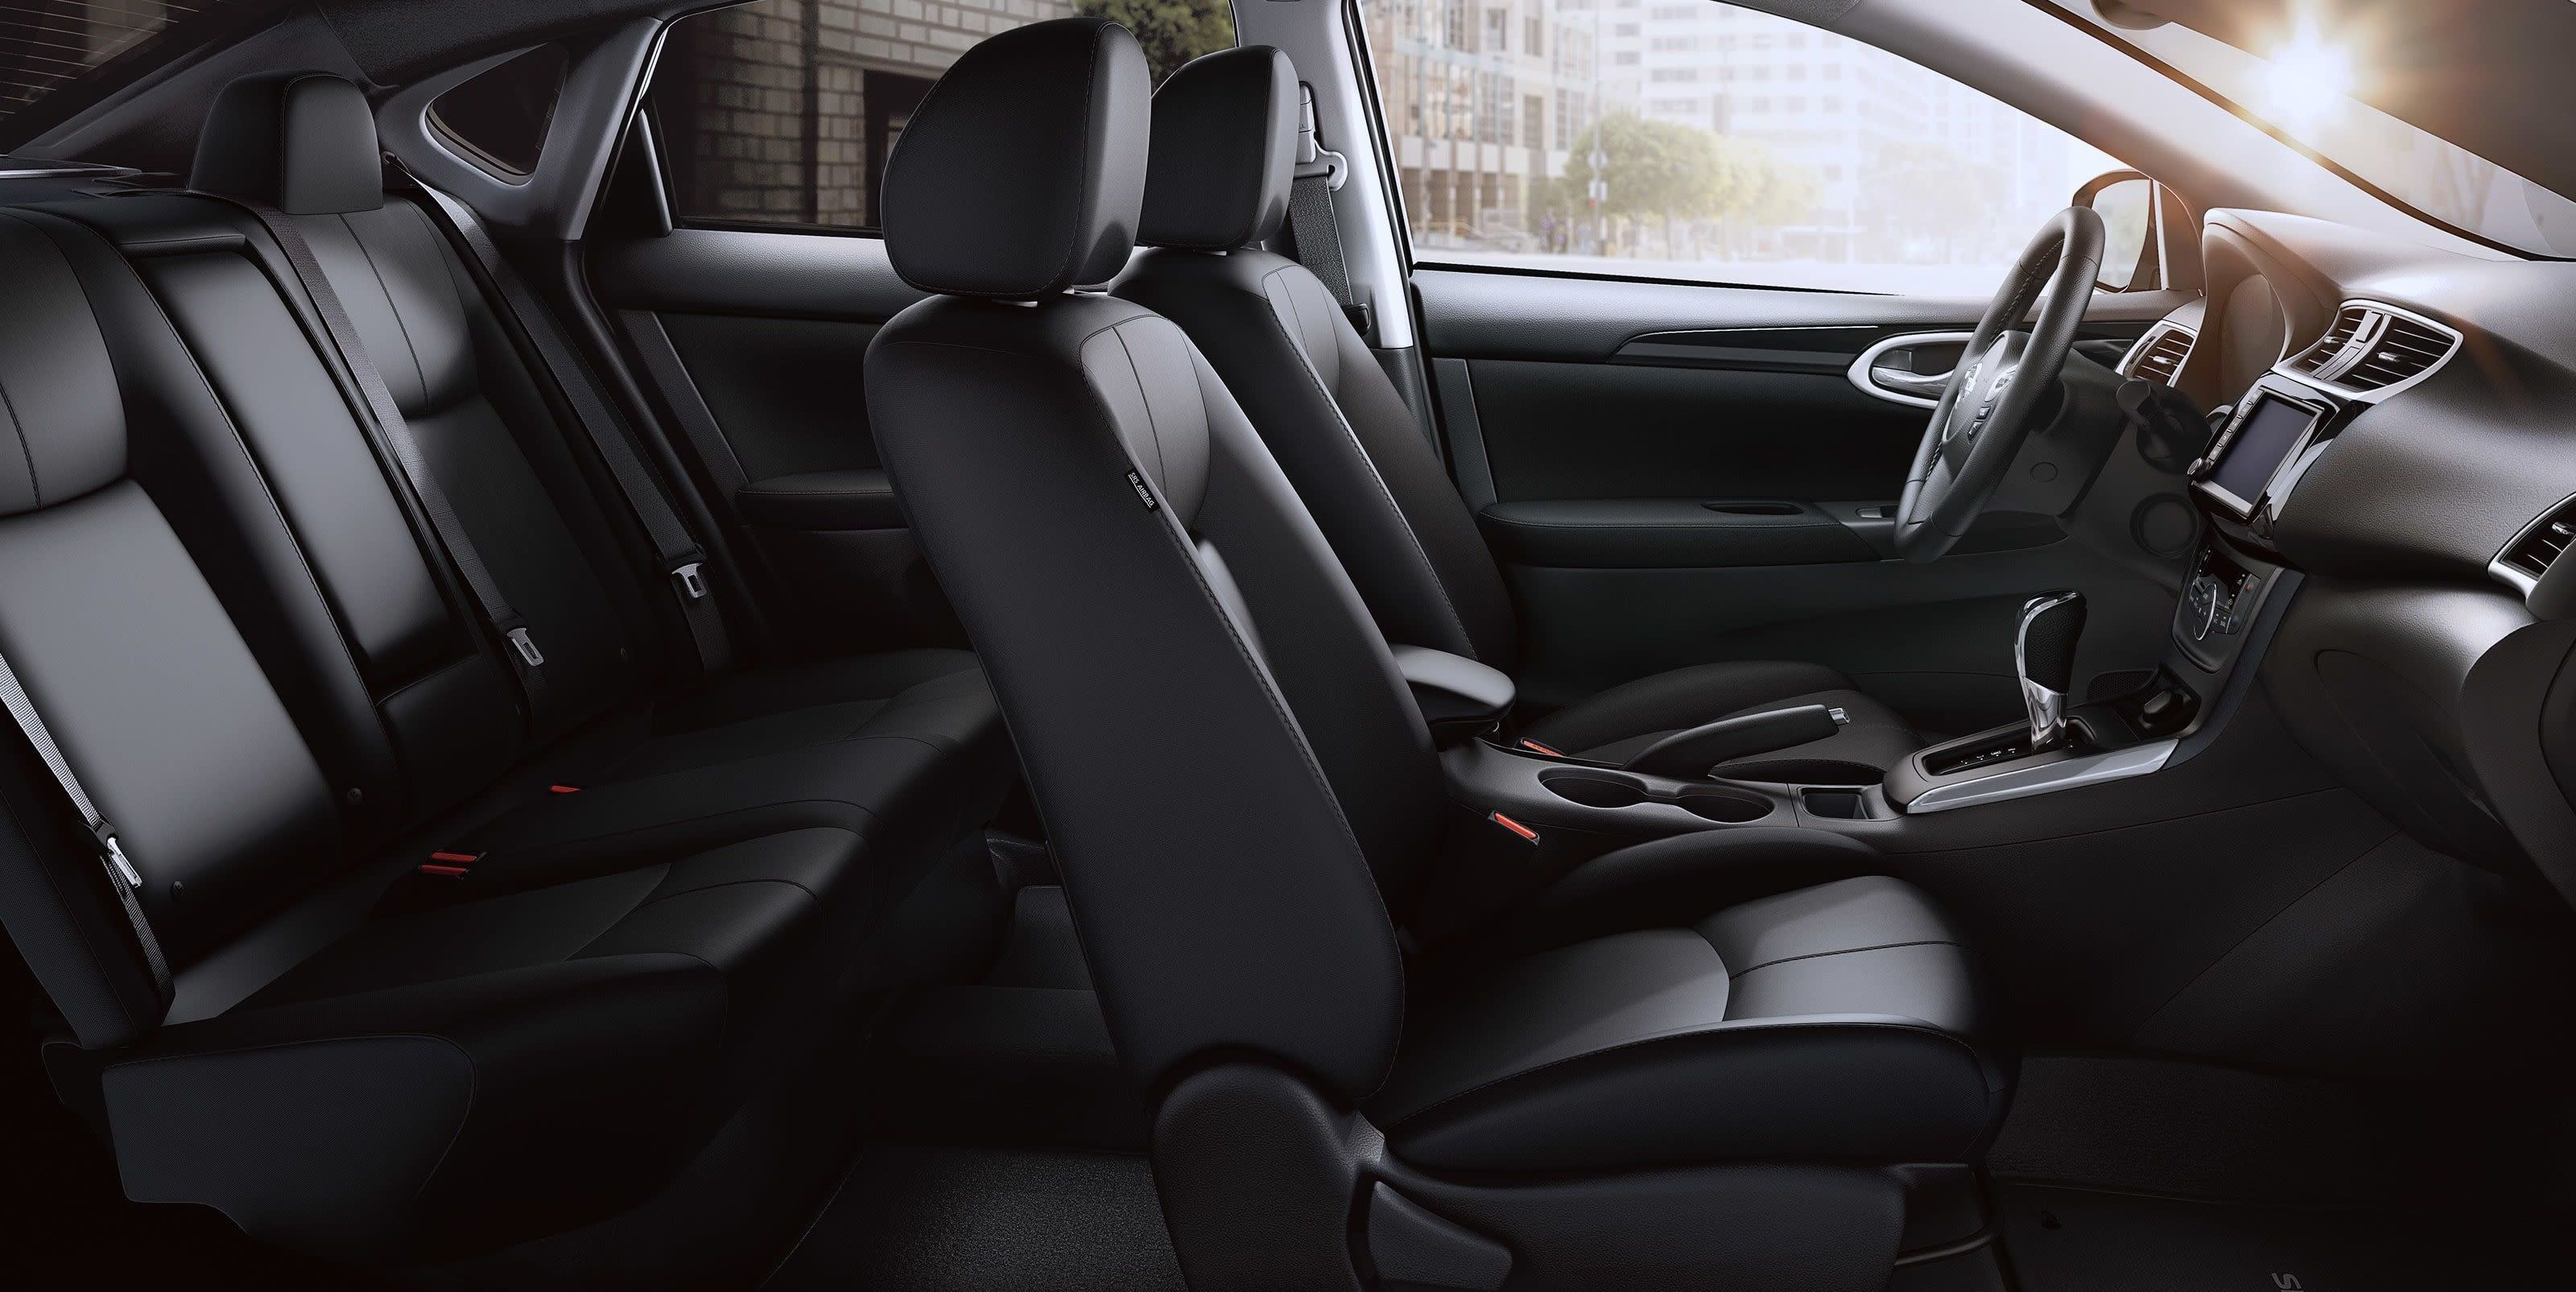 2019 Nissan Sentra Seating